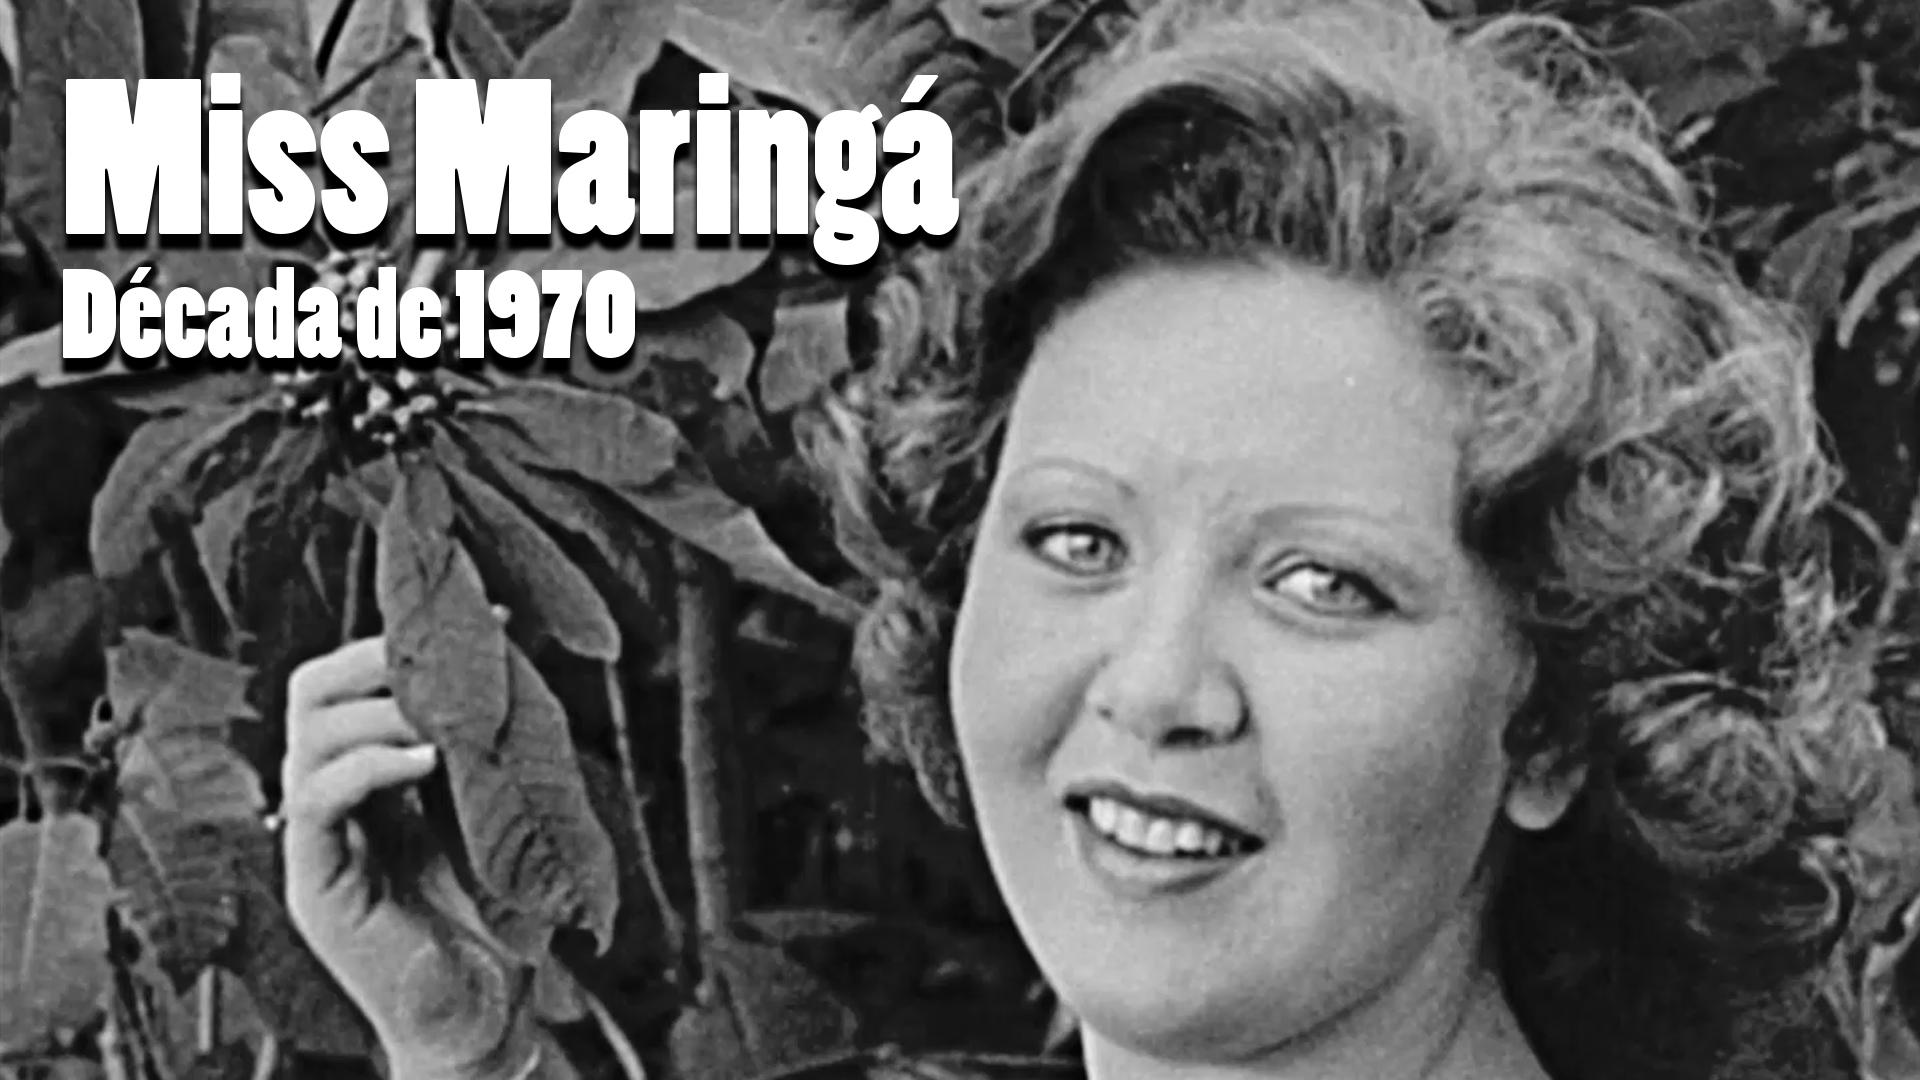 RARIDADE - Miss Maringá nos anos 1970